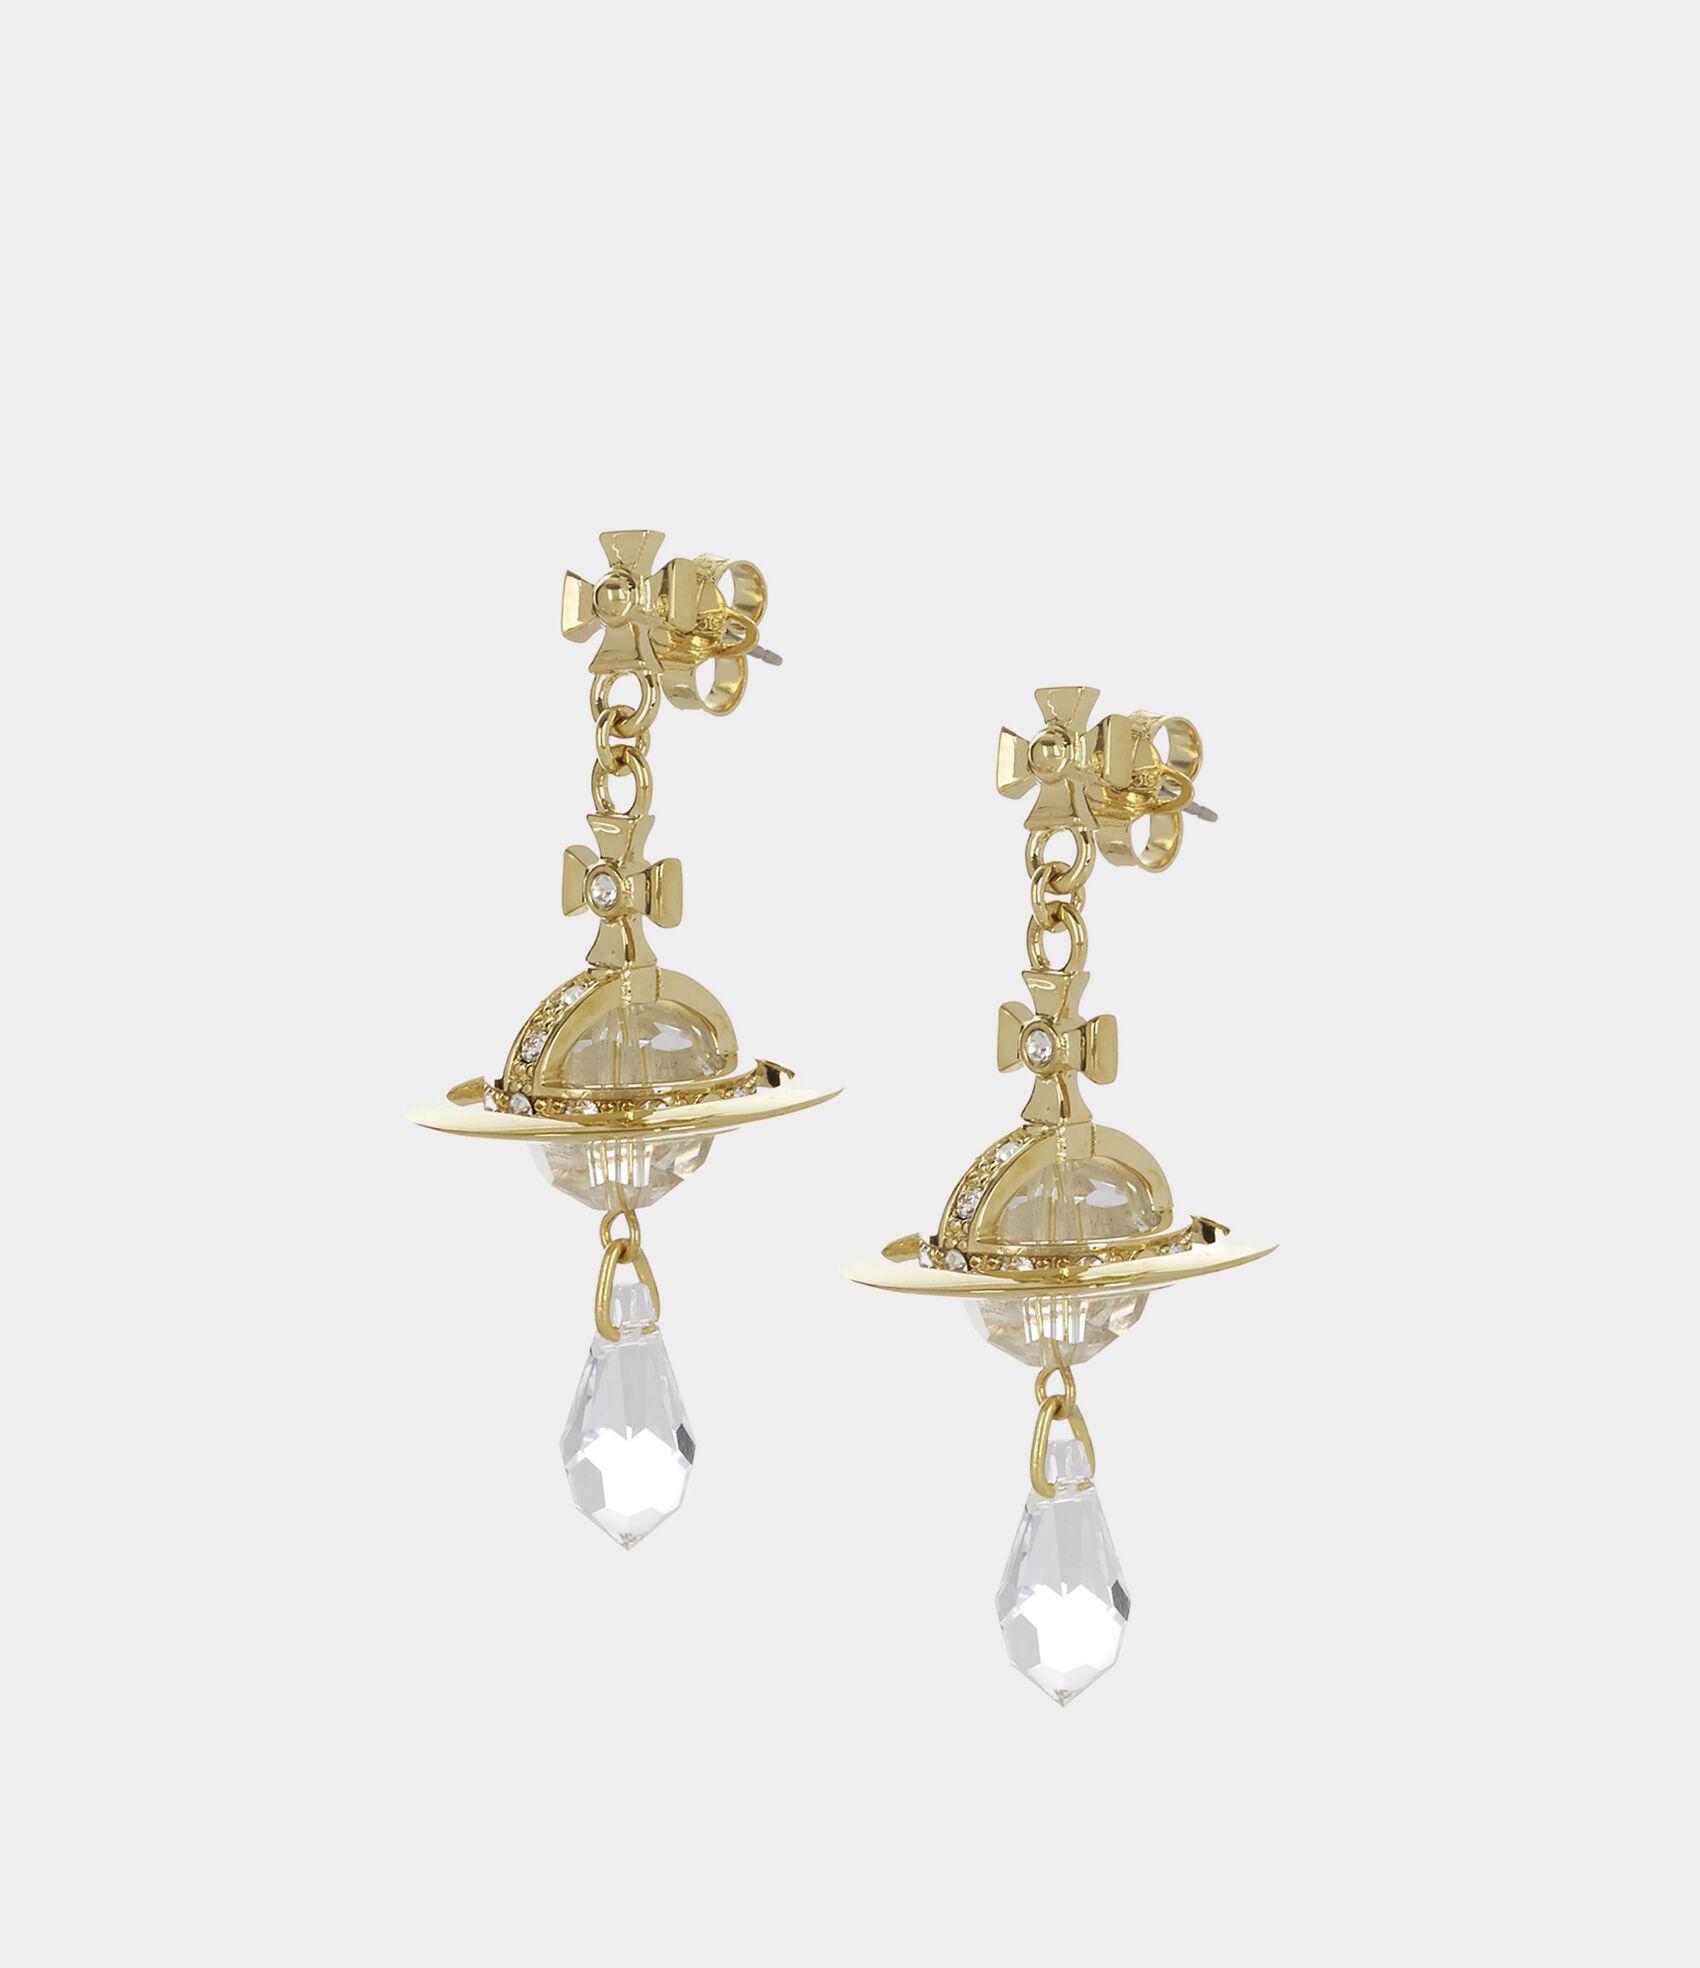 be5e84500 Crystal Orb Earrings Gold Plated   Women's Earrings   Vivienne Westwood